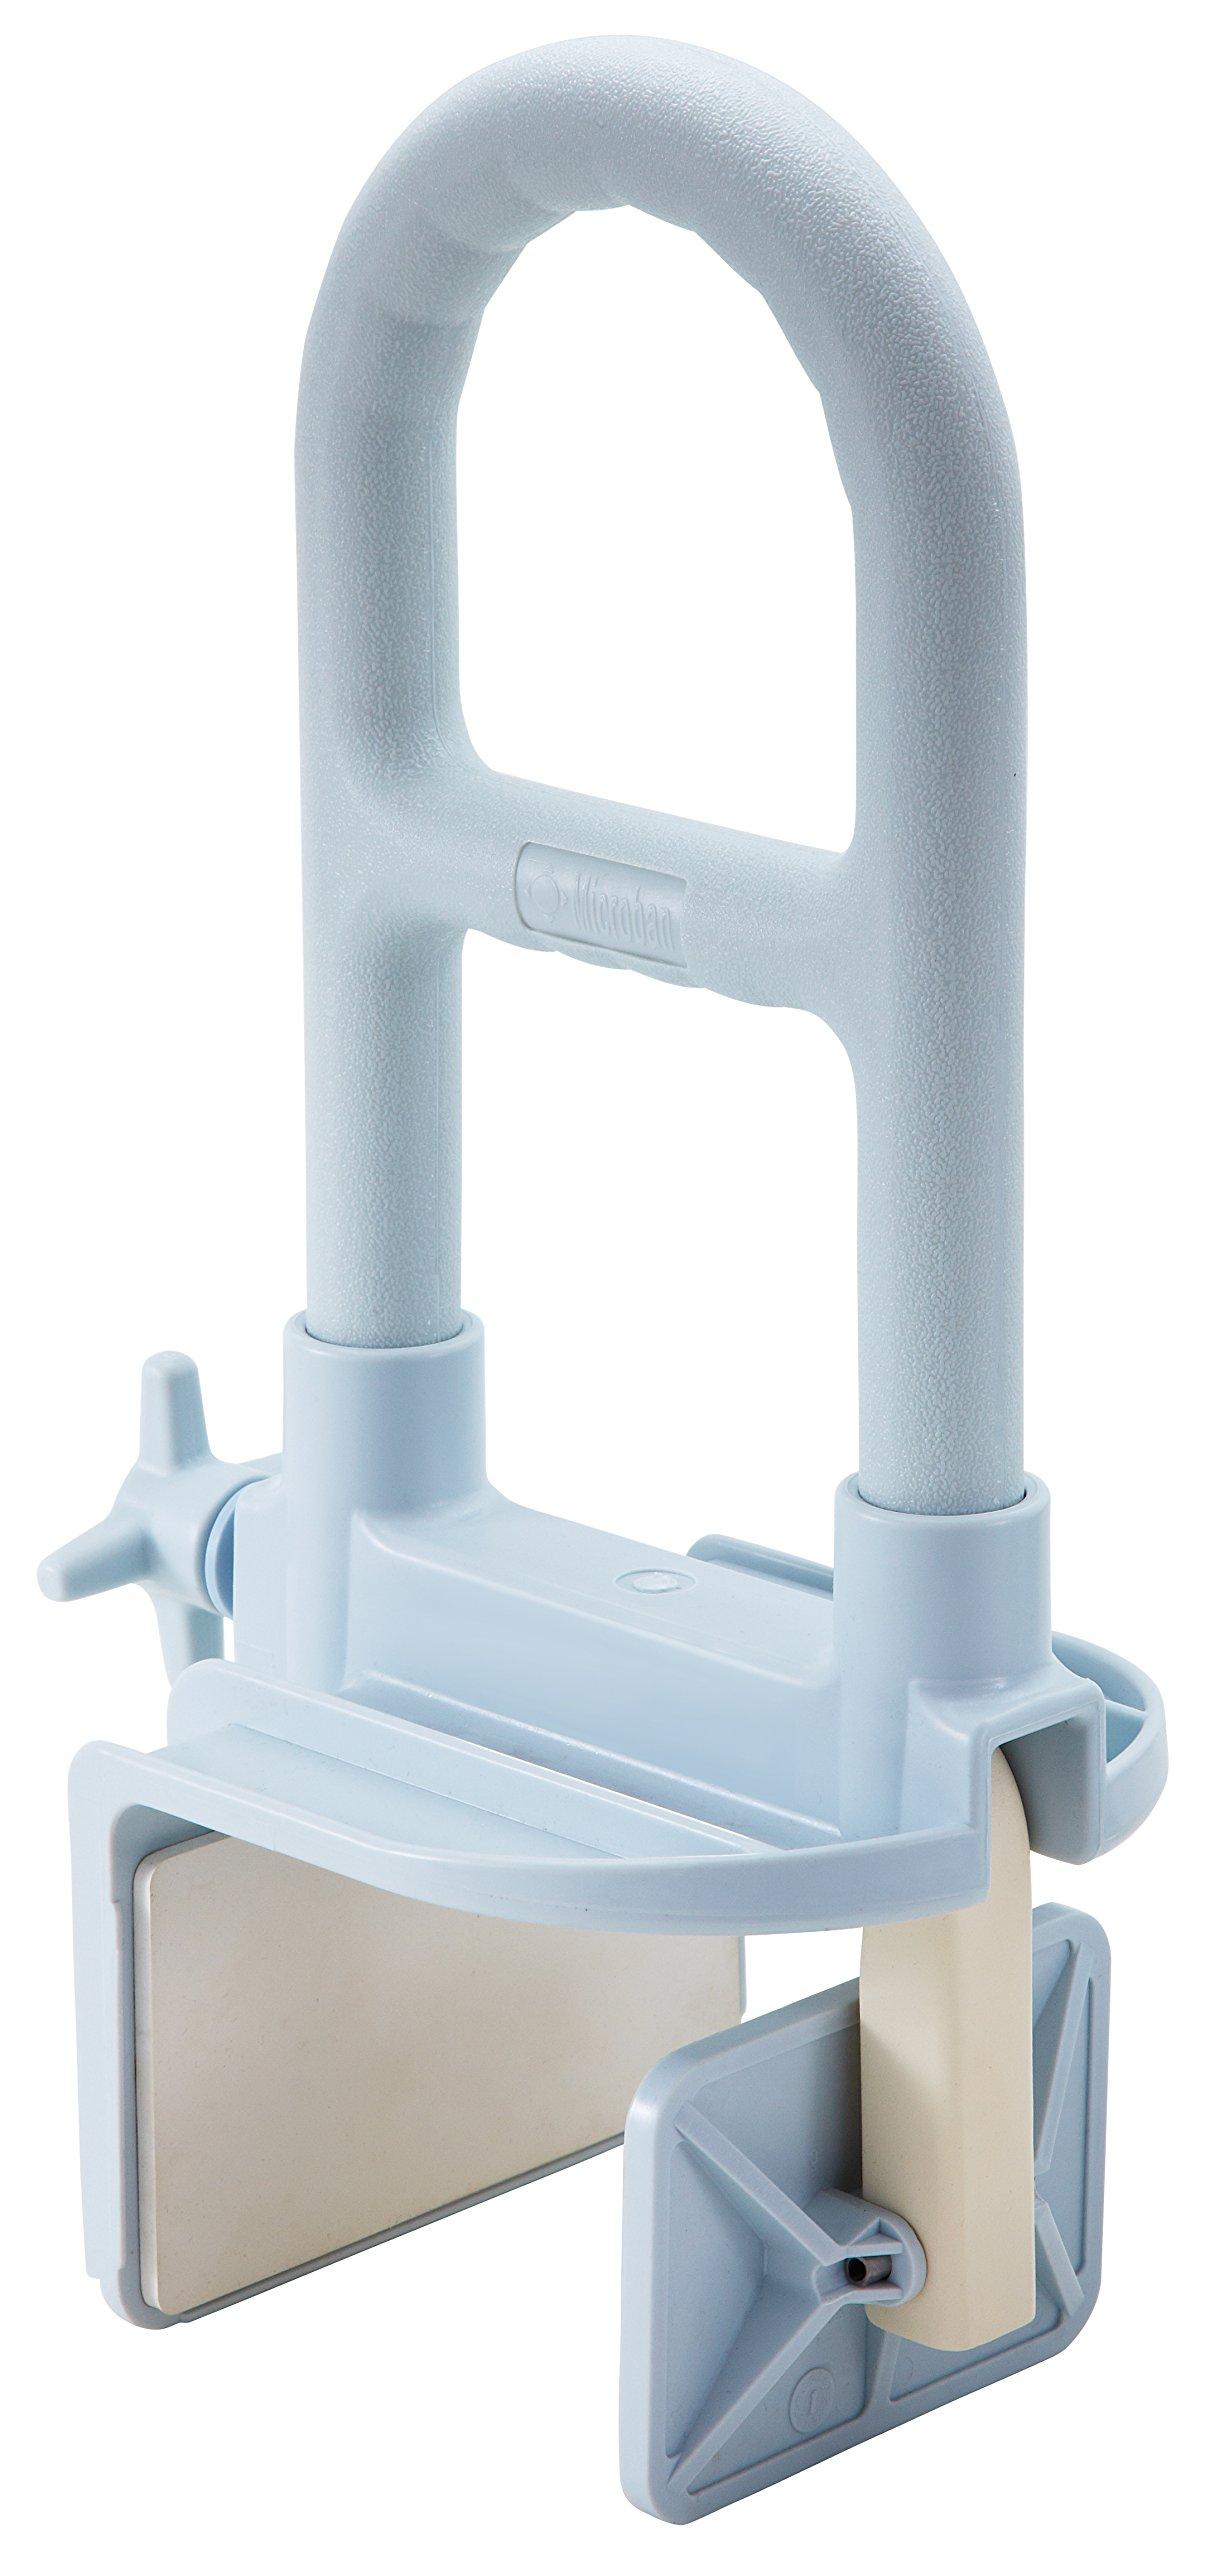 Amazon.com: Medline Bathtub Safety Grab Bar, Shower Rail, Microban ...